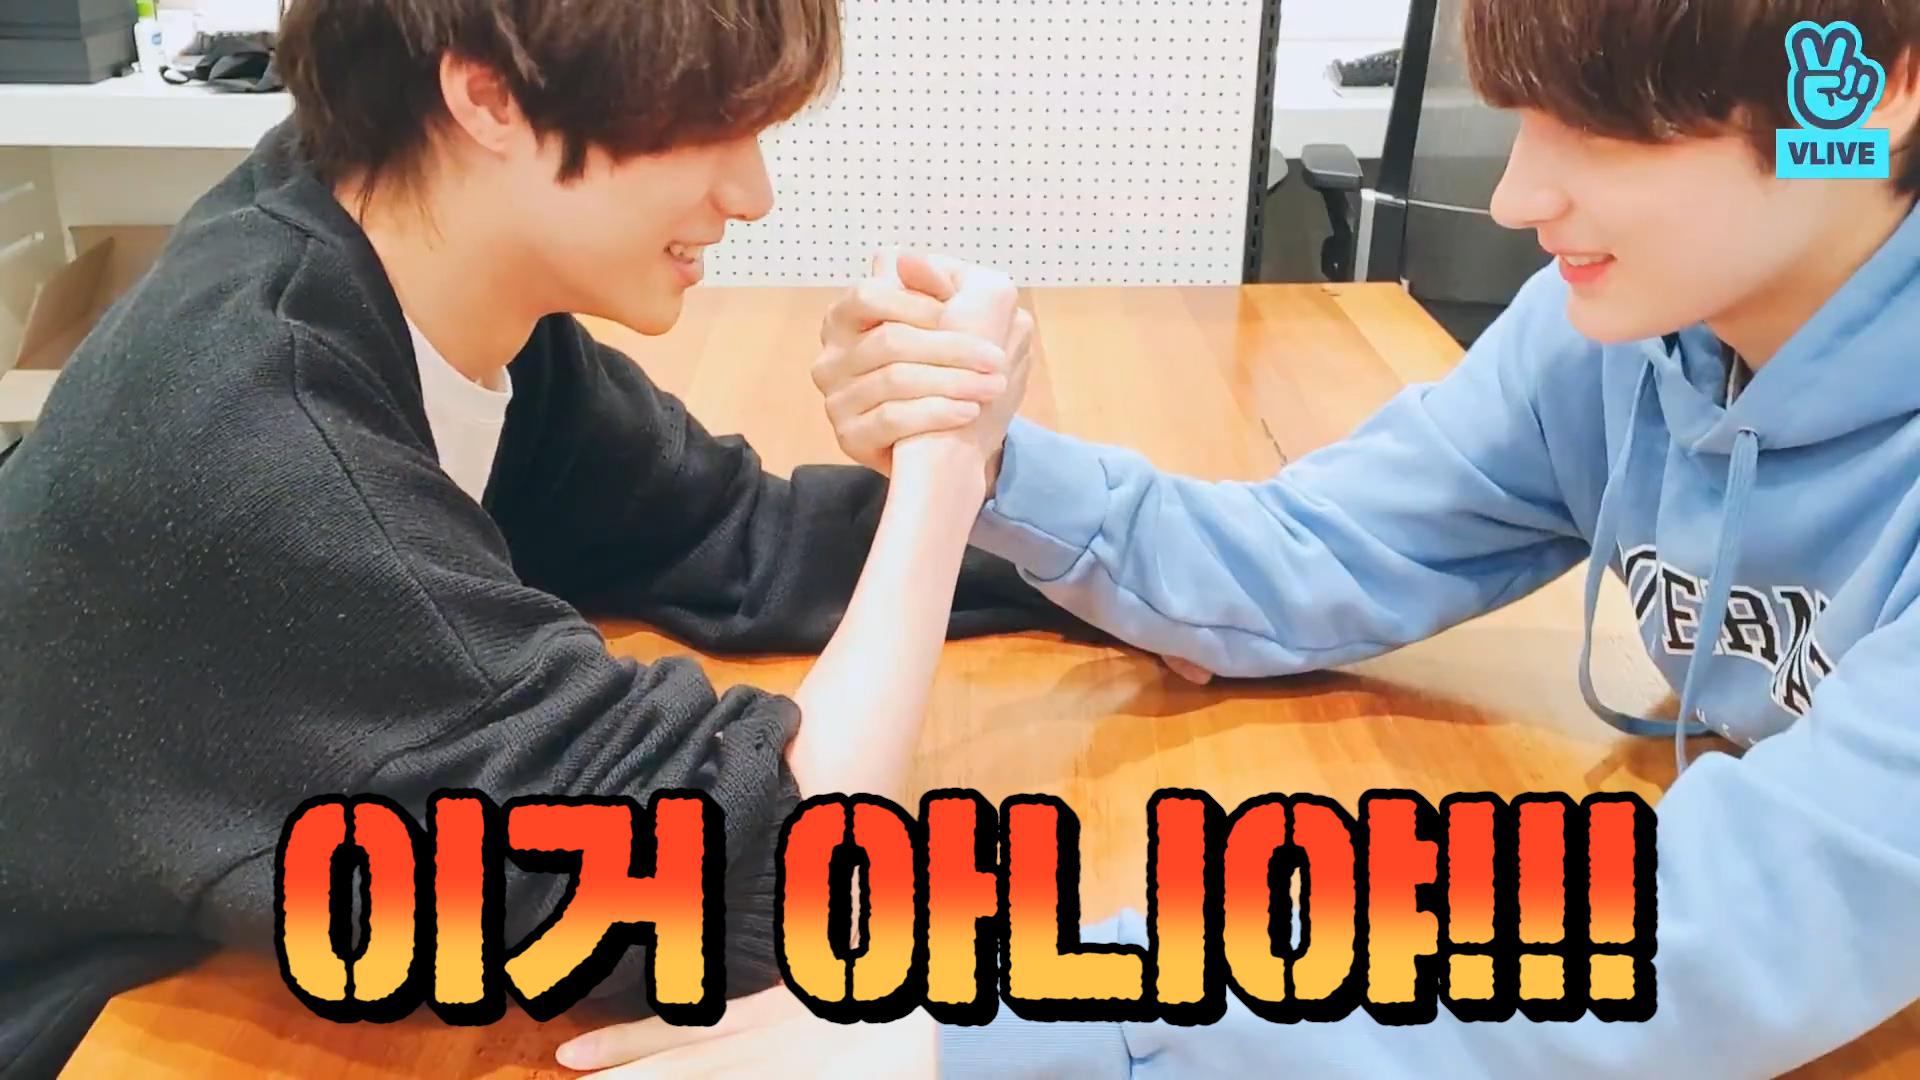 [TXT] 멈춰버린 팔씨름 안에서 발견한 뀨닝의 귀여움💪 (Beomgyu&Hueningkai doing arm wrestling)